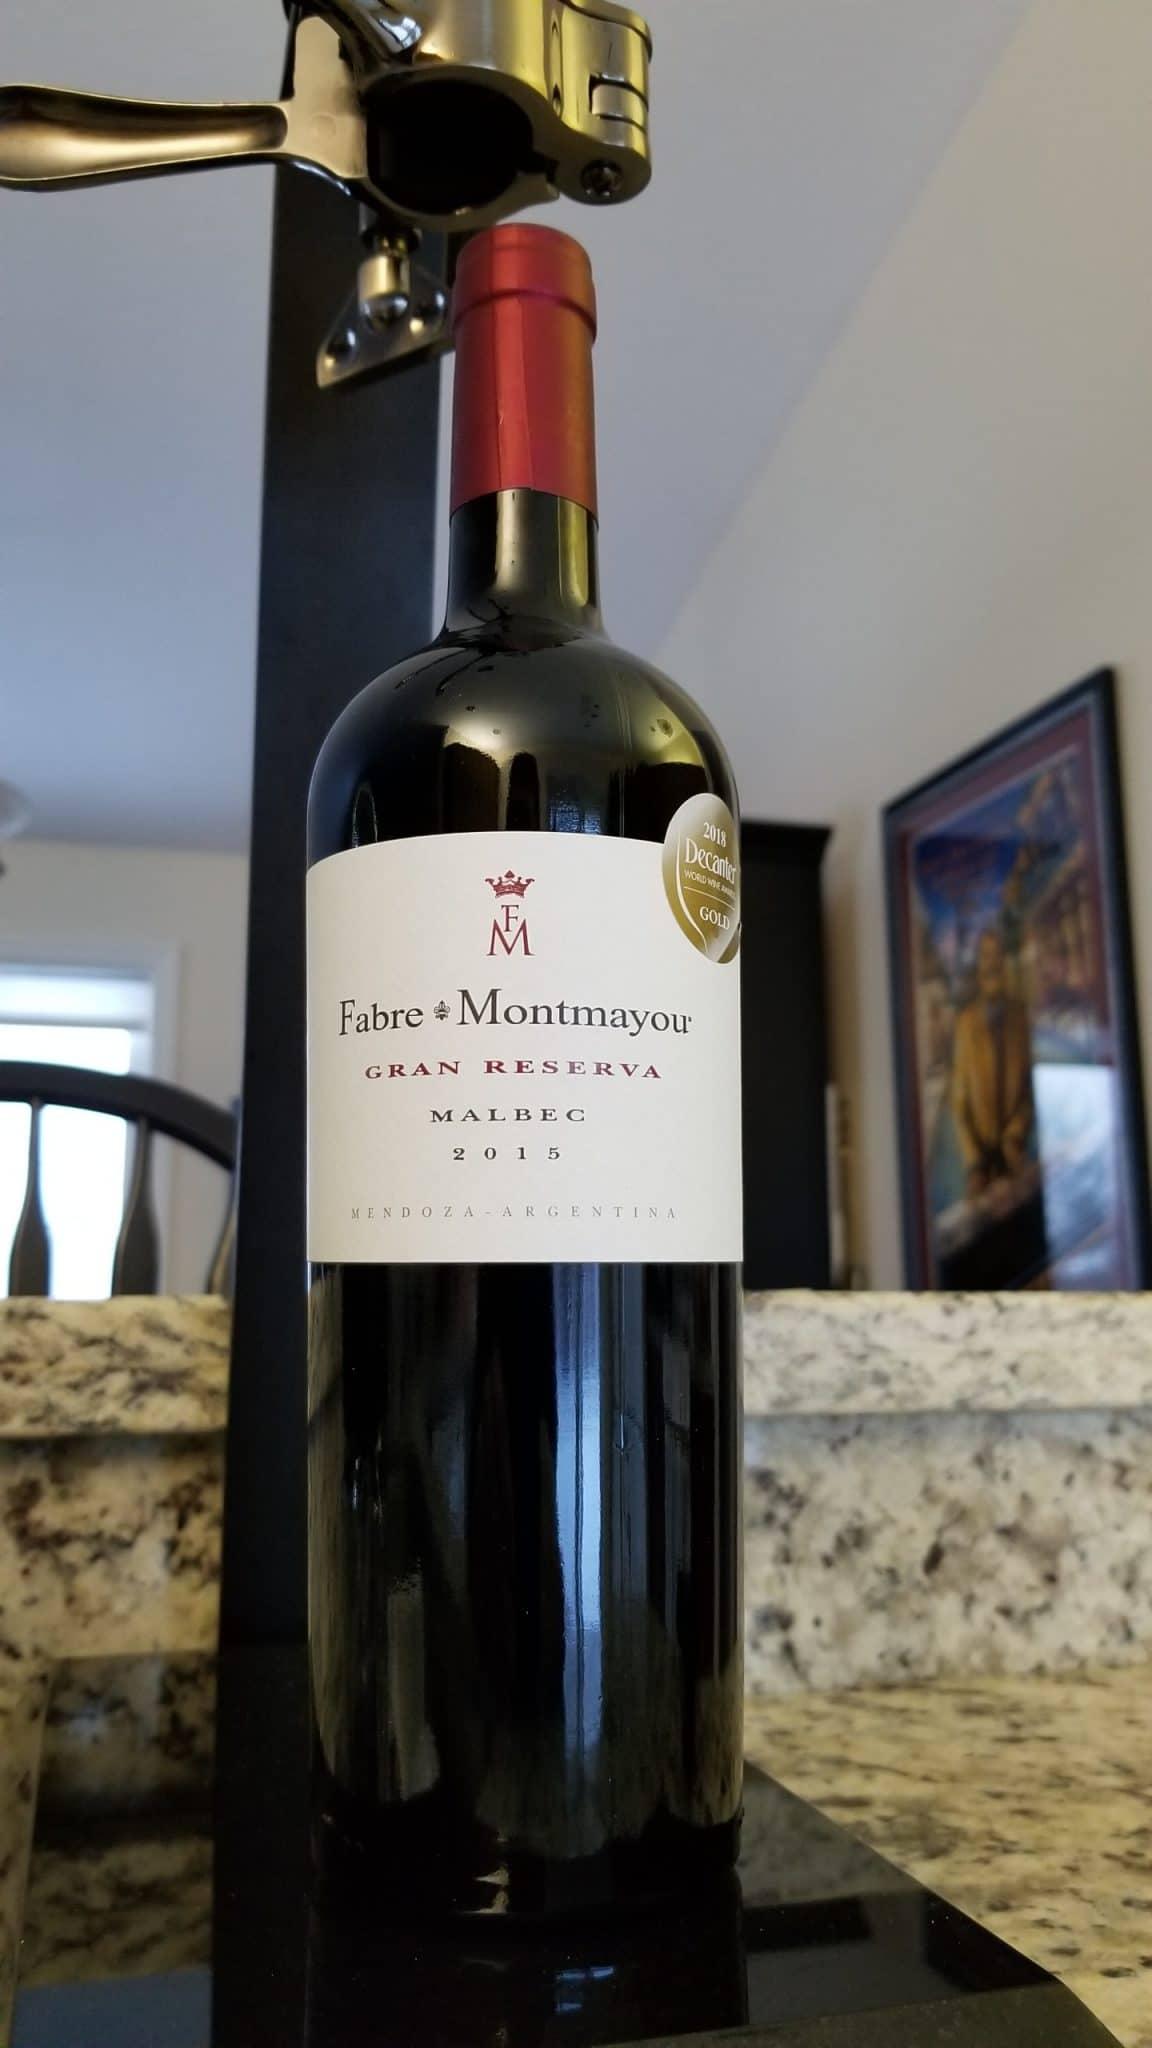 $24.95 - Fabre Montmayou Gran Reserva Malbec 2015